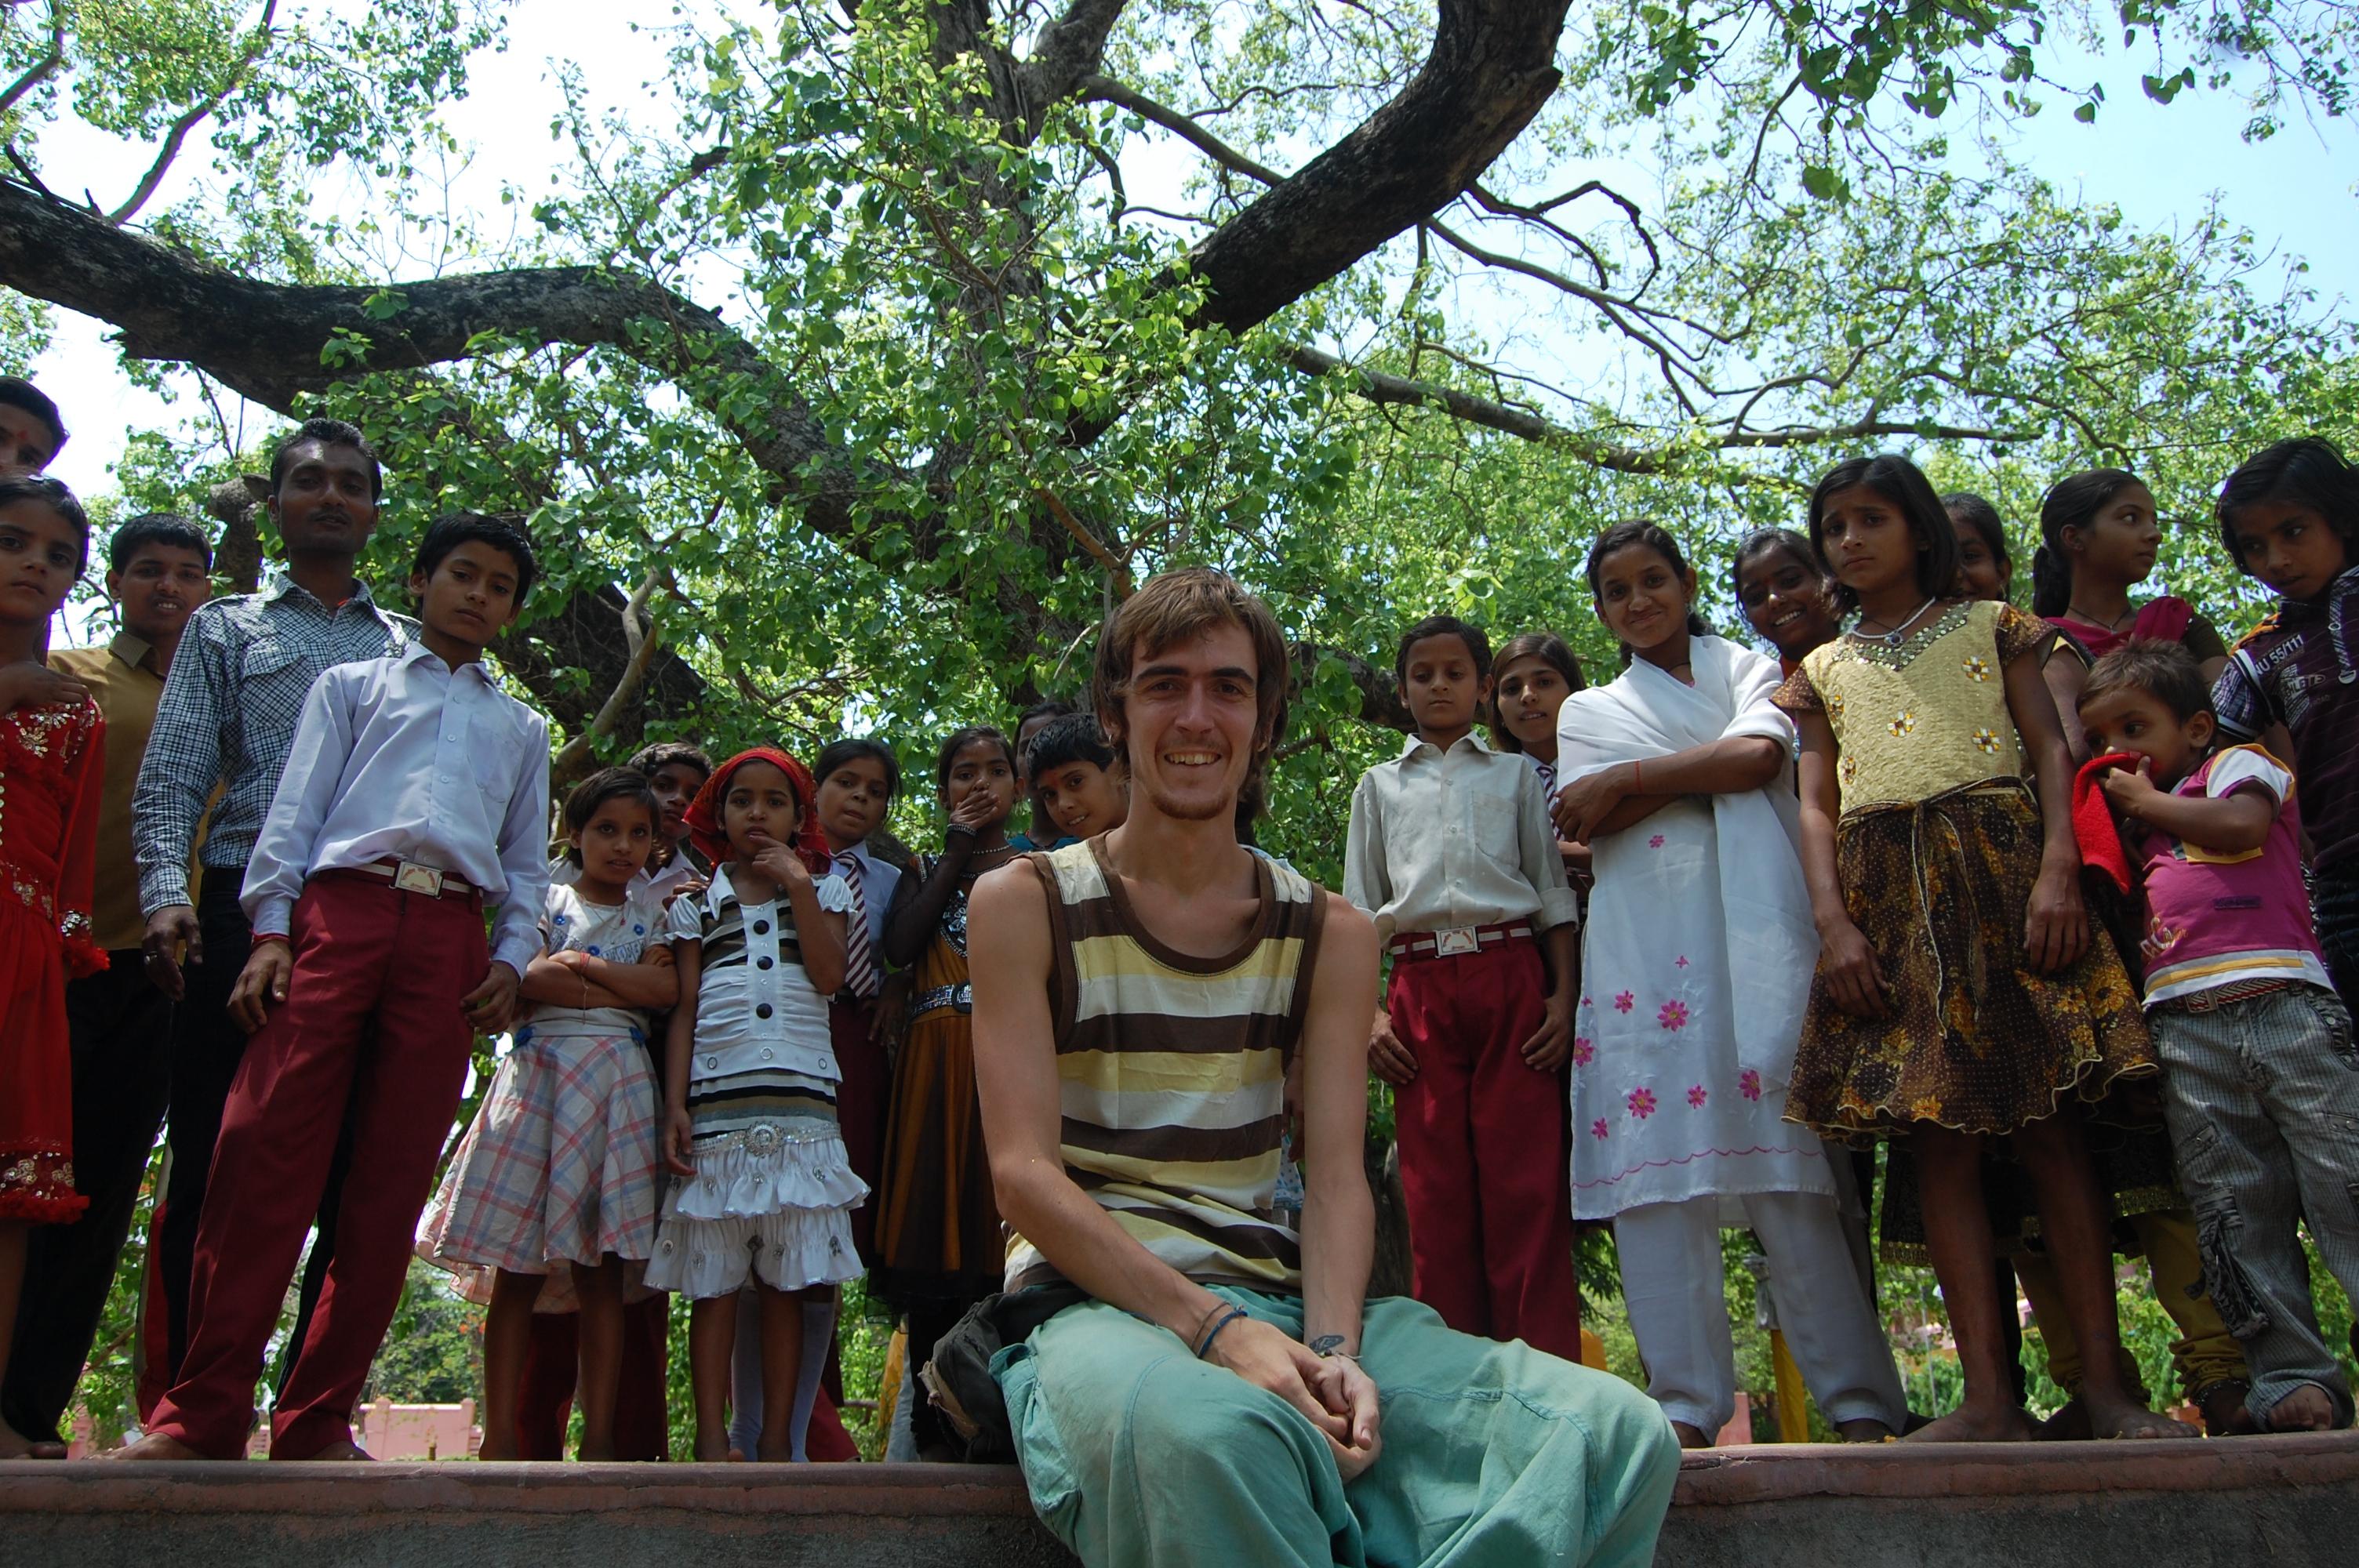 Jairo, blog Mochila Nómada en Bodhgaya (India)